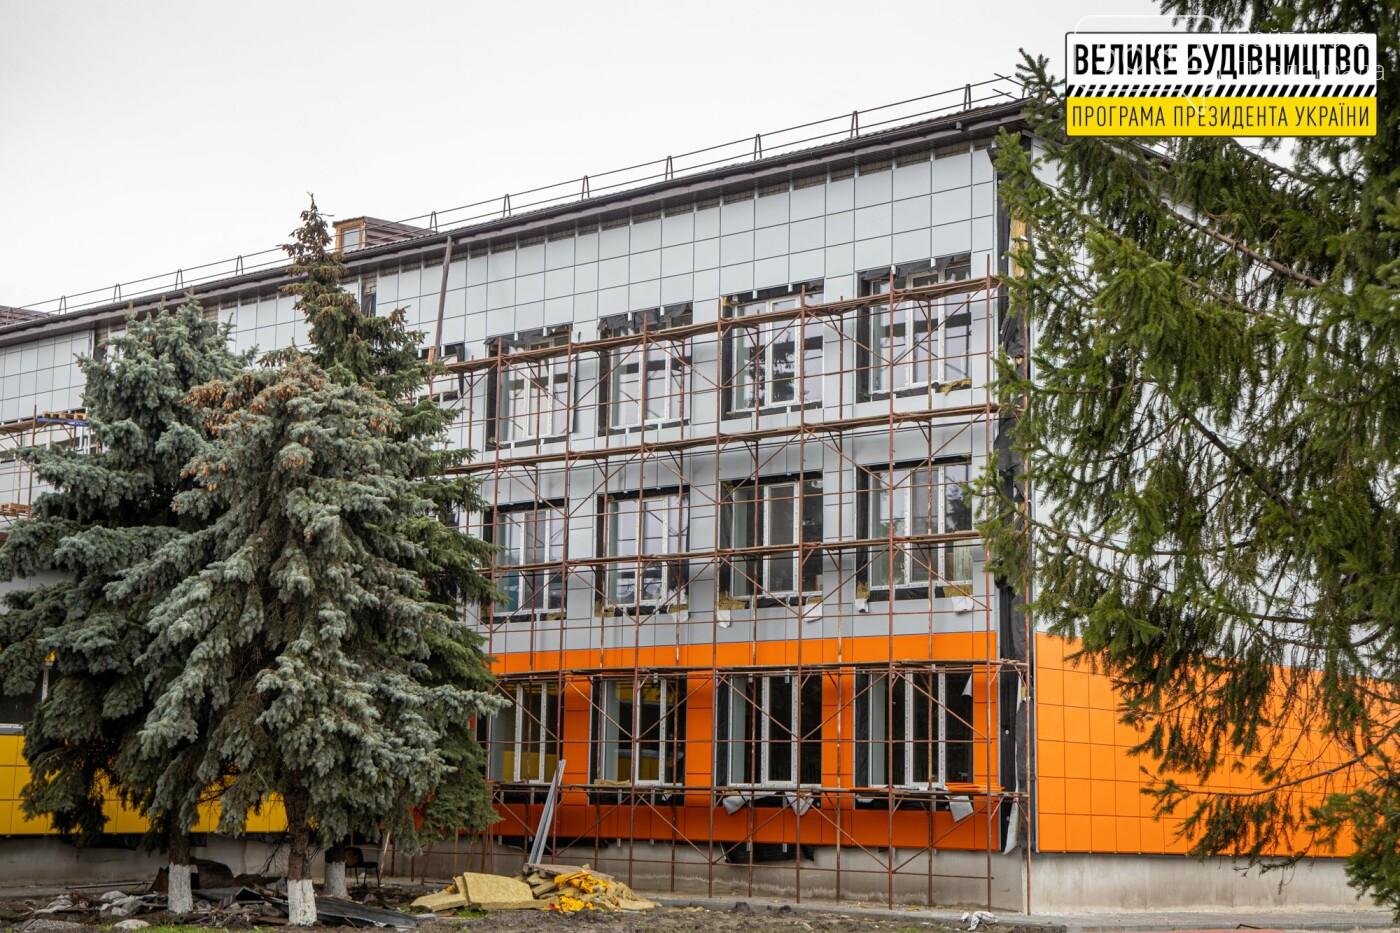 В Петропавловке модернизируют опорную школу (ФОТОРЕПОРТАЖ), фото-2